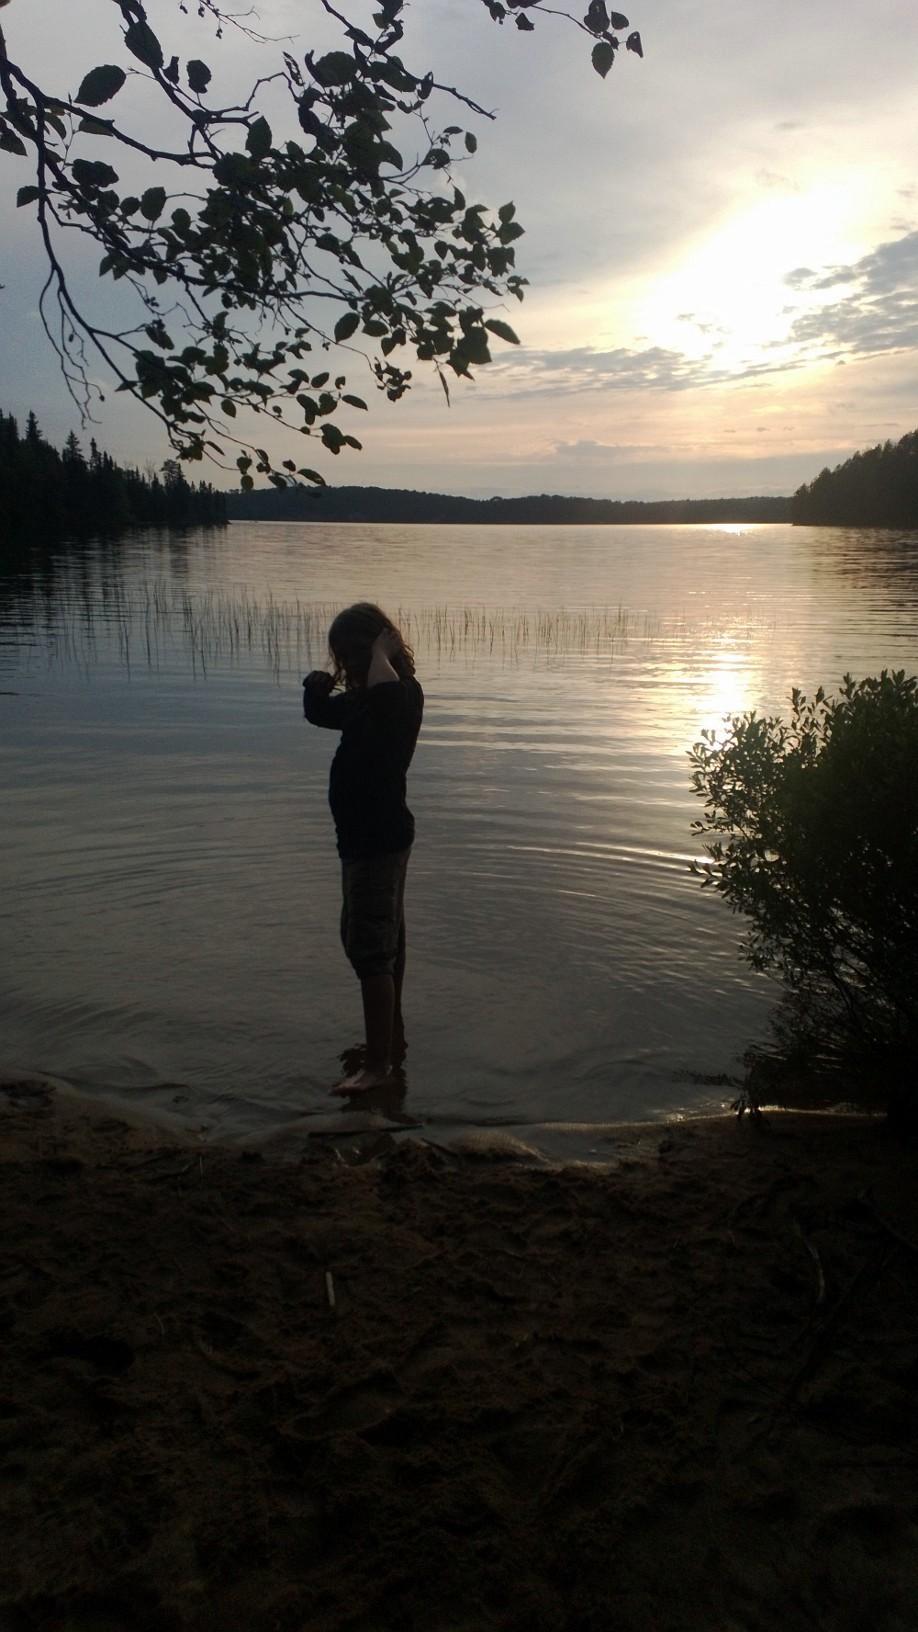 Cirrus sunset at camp